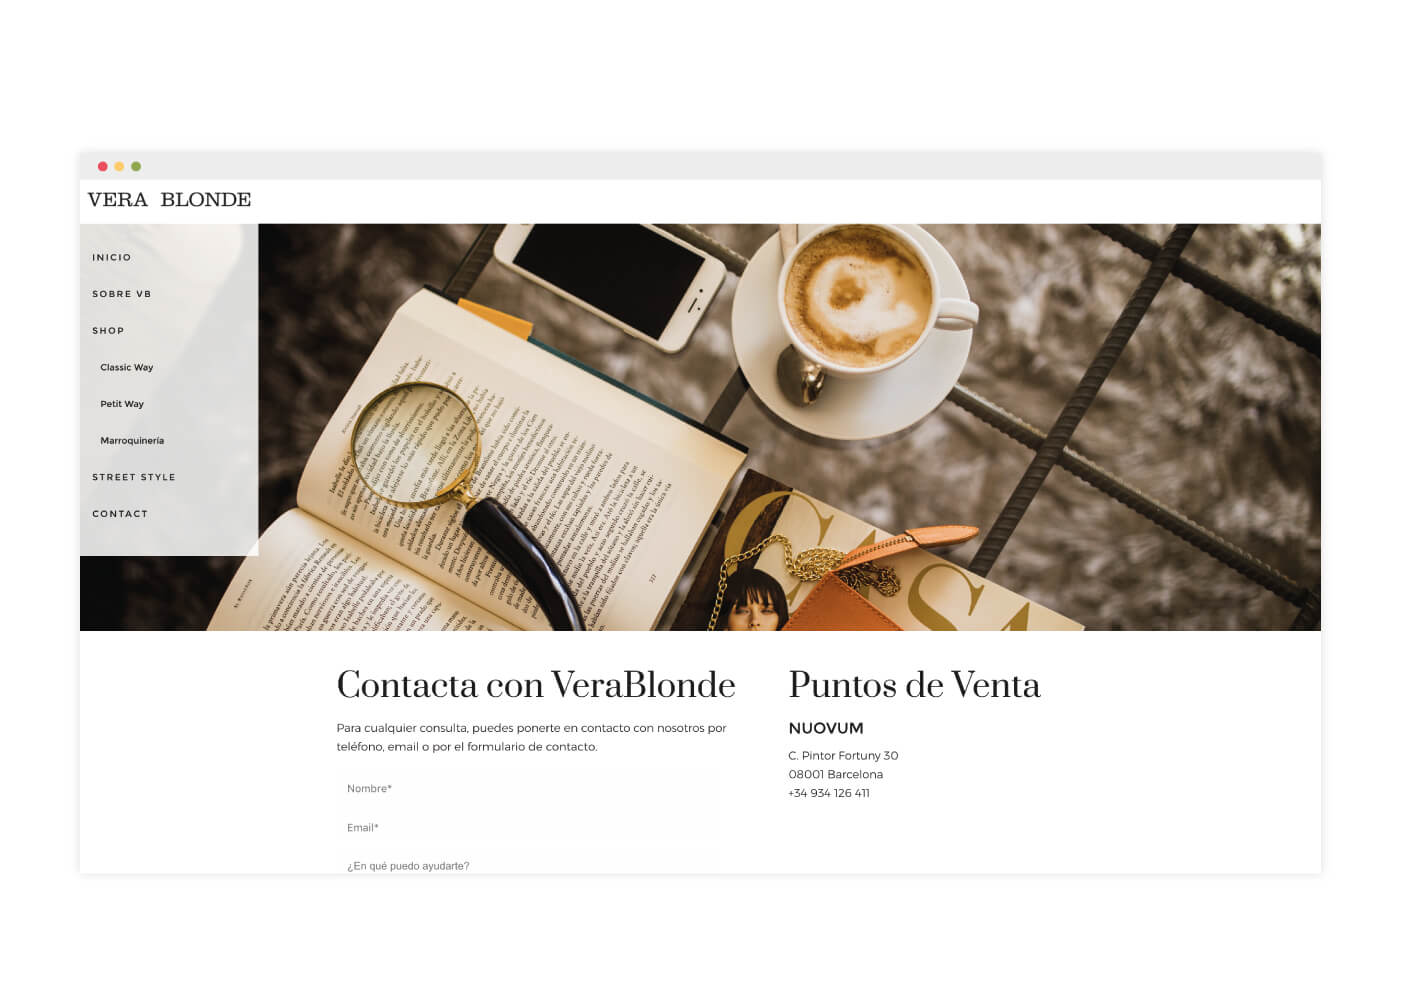 diseno-programacion-tienda-online-bolsos-vera-blonde-9